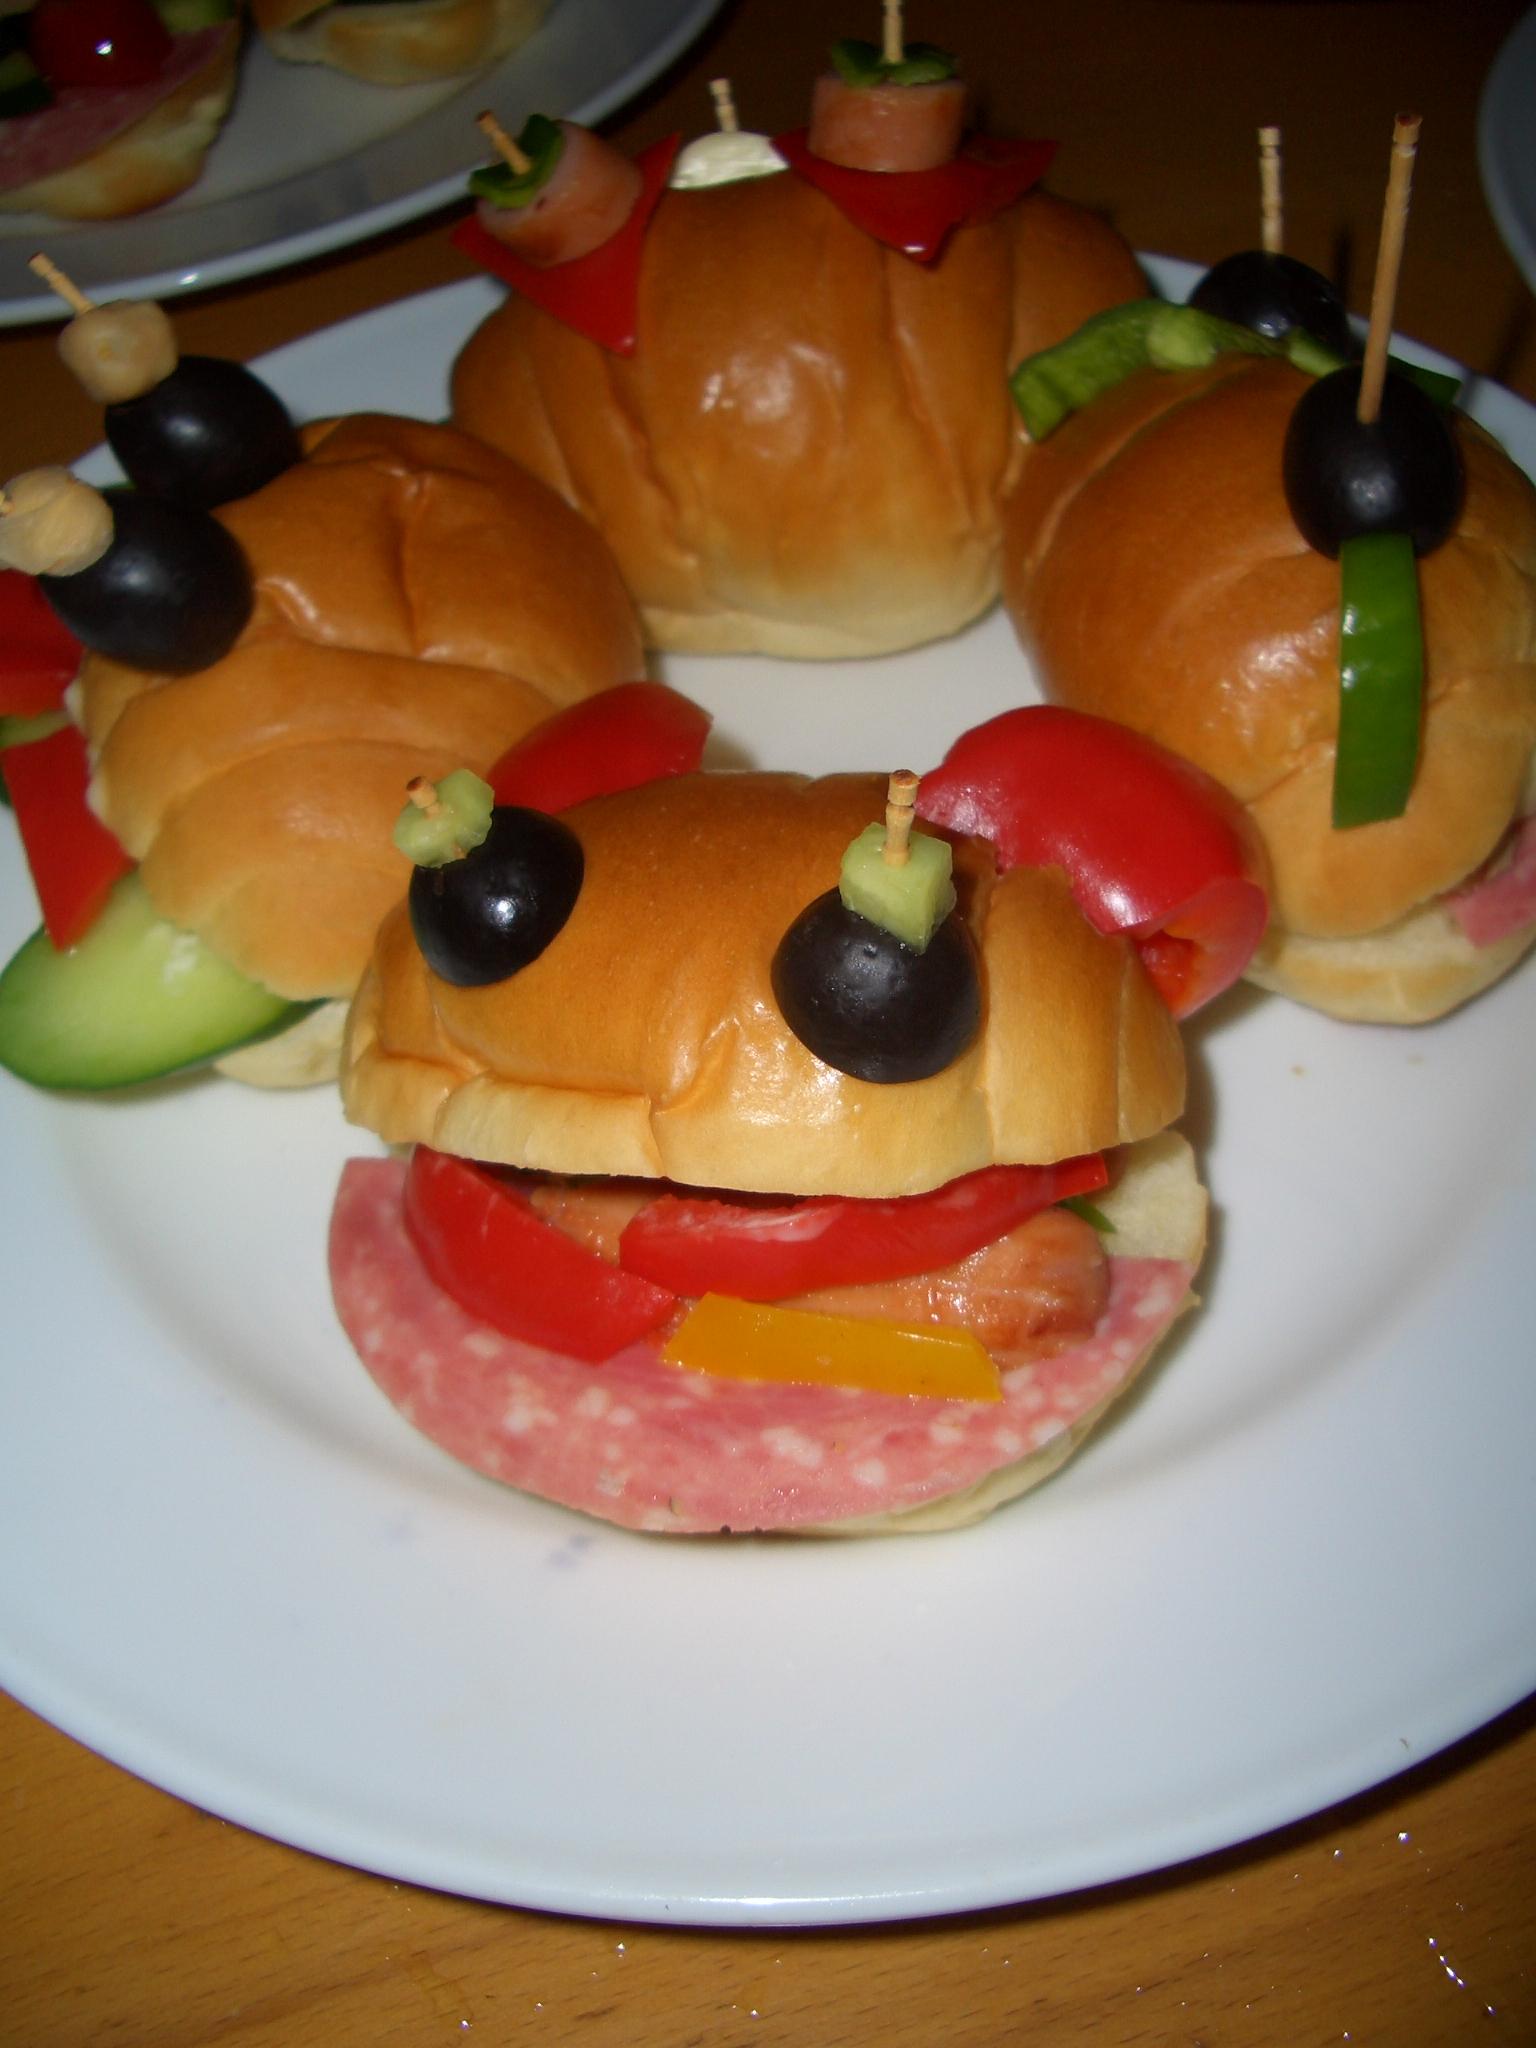 Bug rolls - Thanks Mami